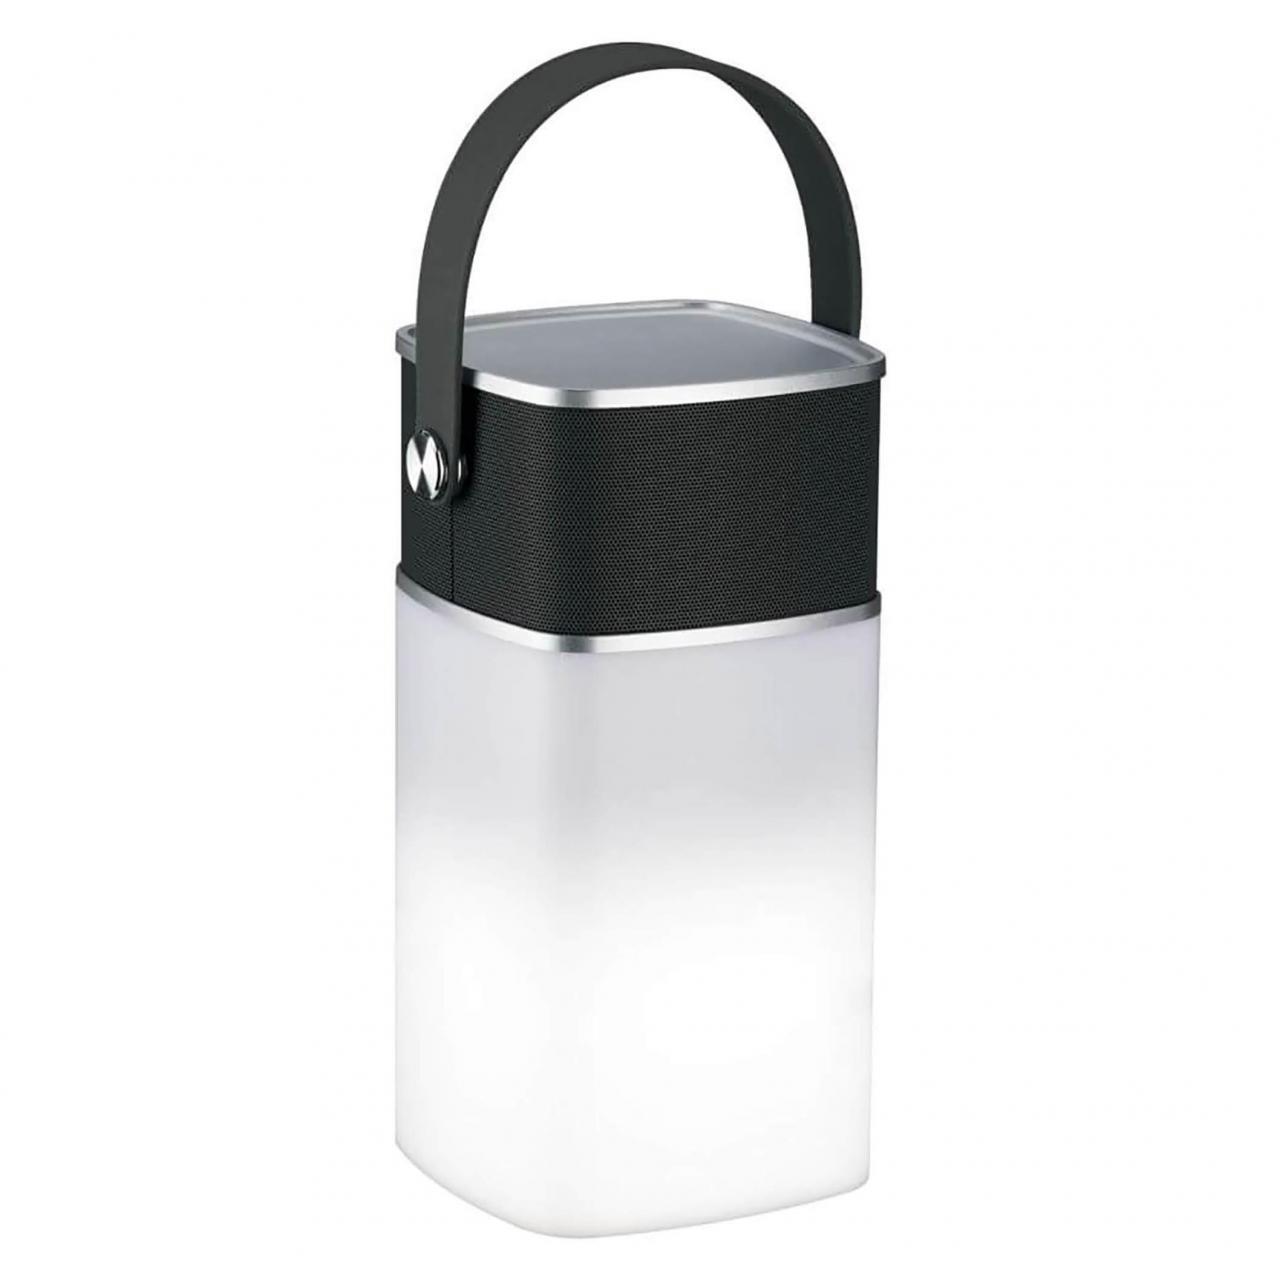 Переносной светодиодный фонарь Paulmann Accu Tablelamp Clutch от аккумулятора 150х95х95 94211